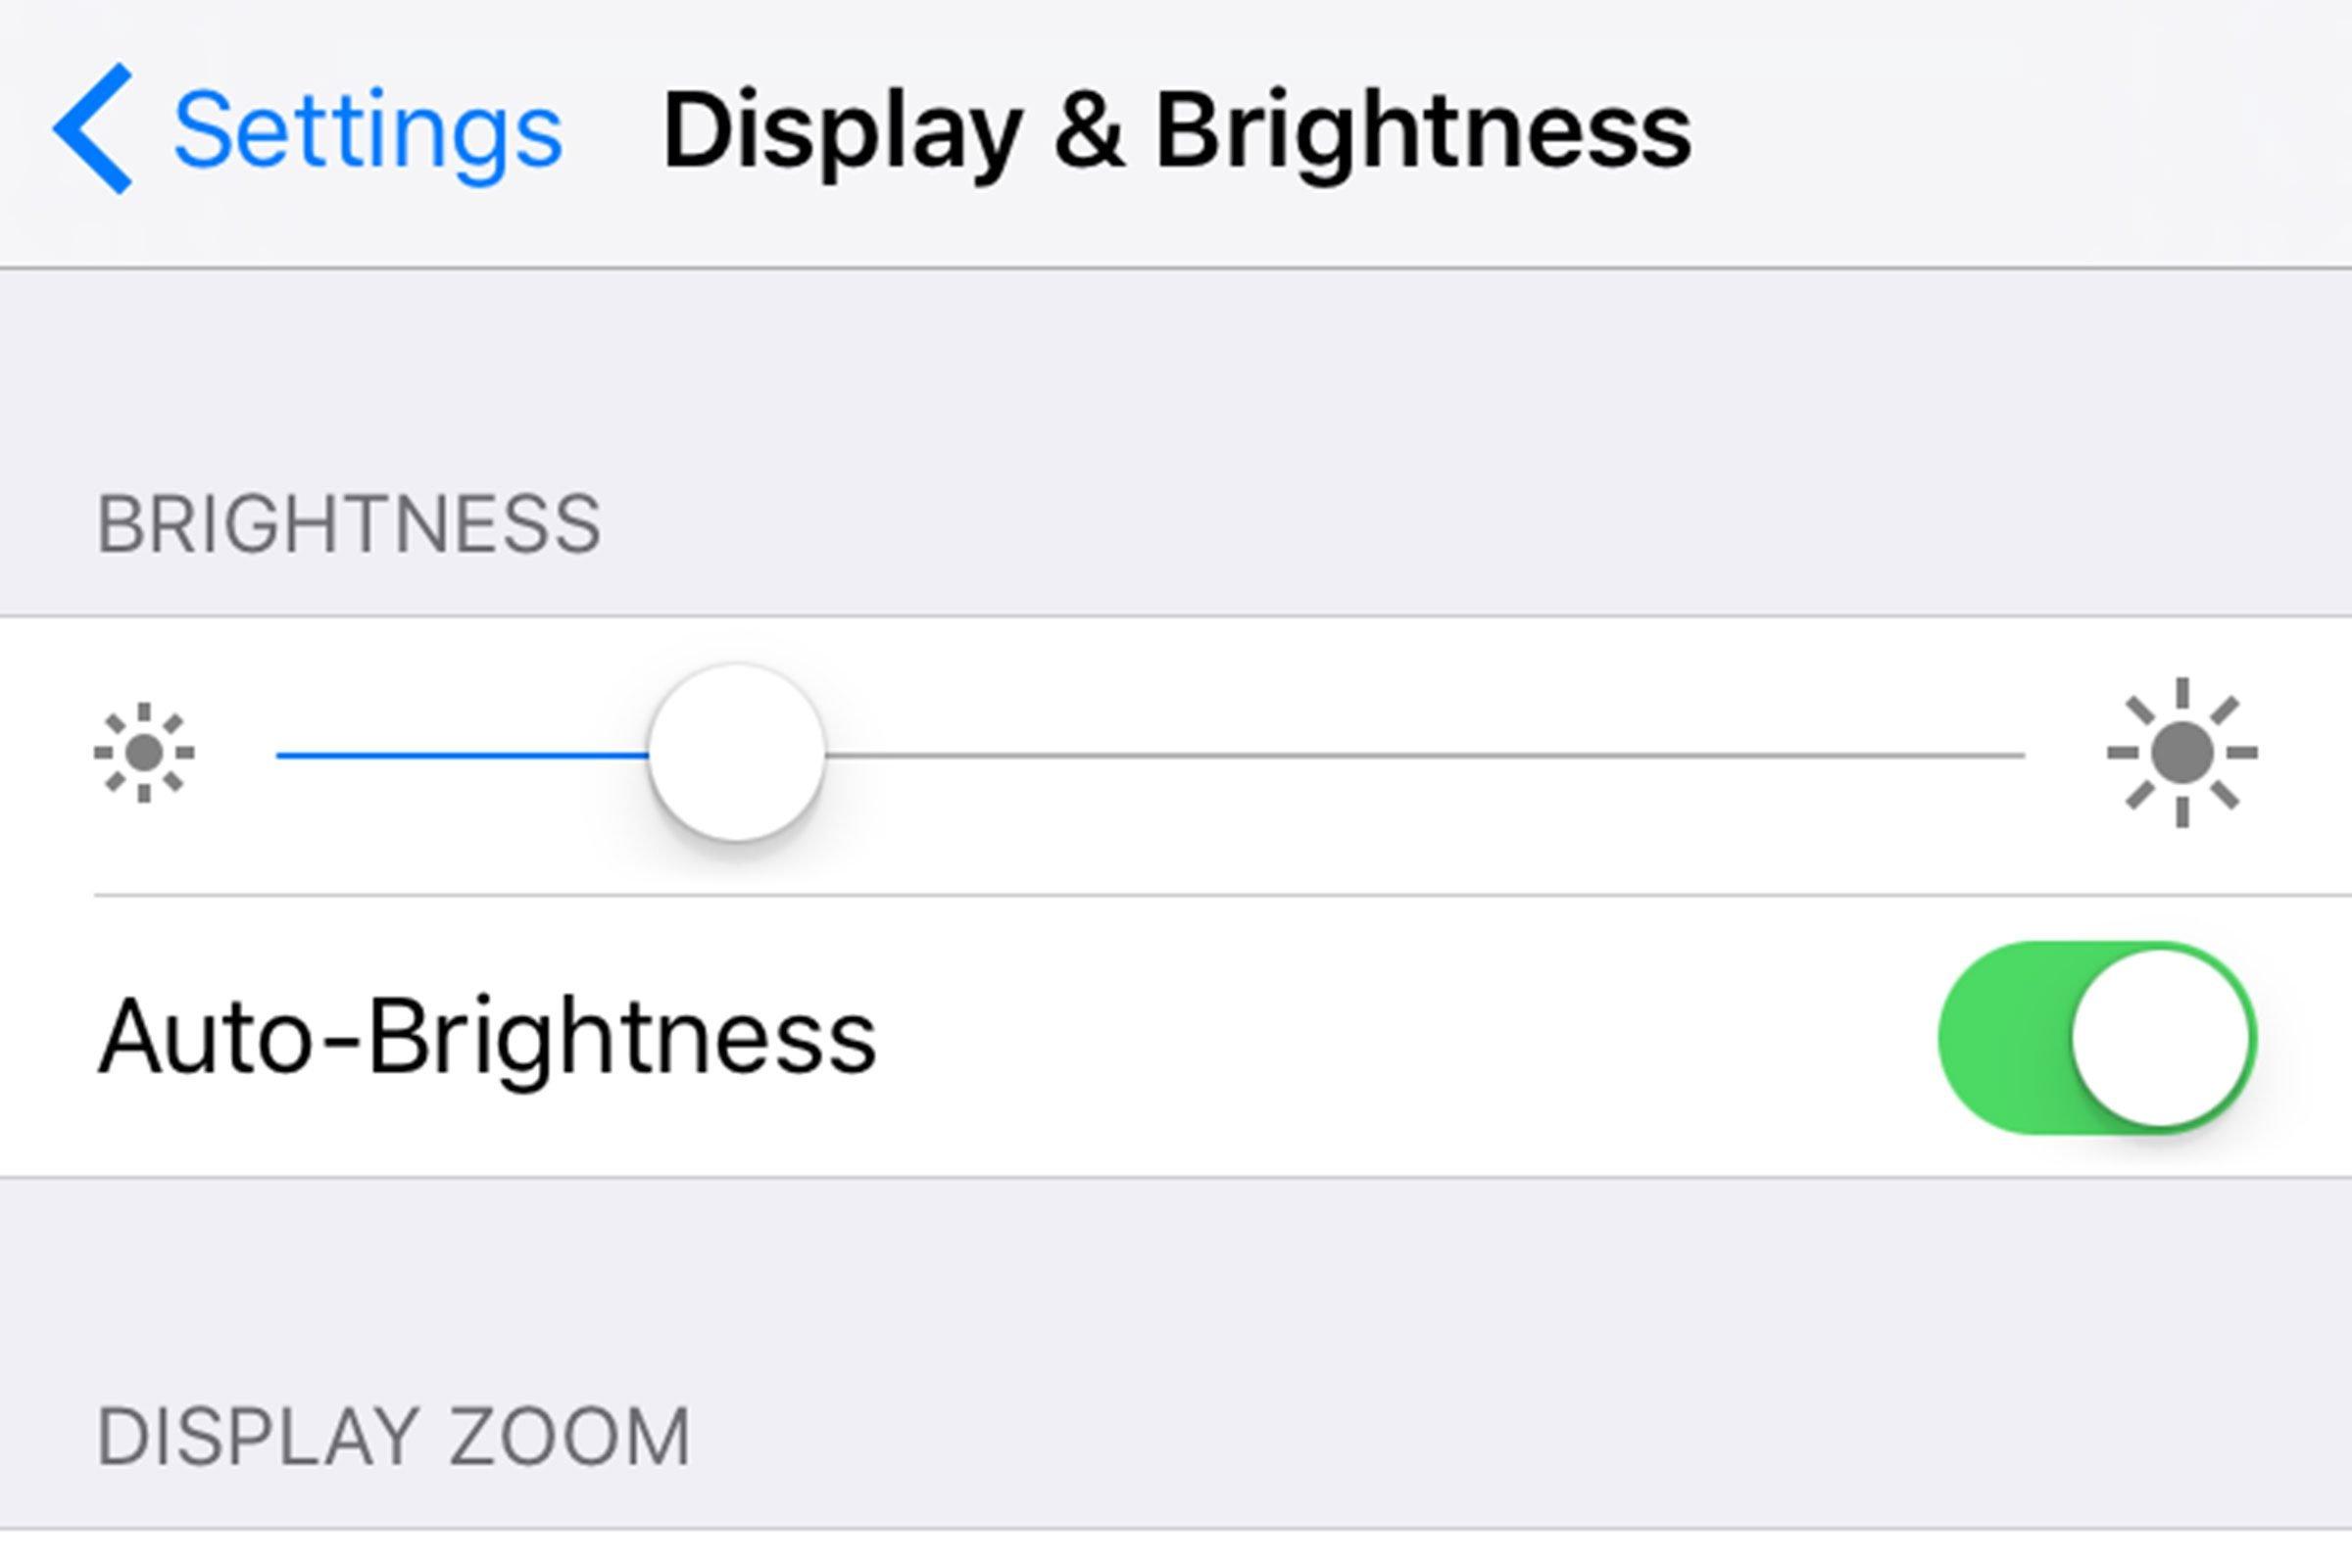 Lower the brightness